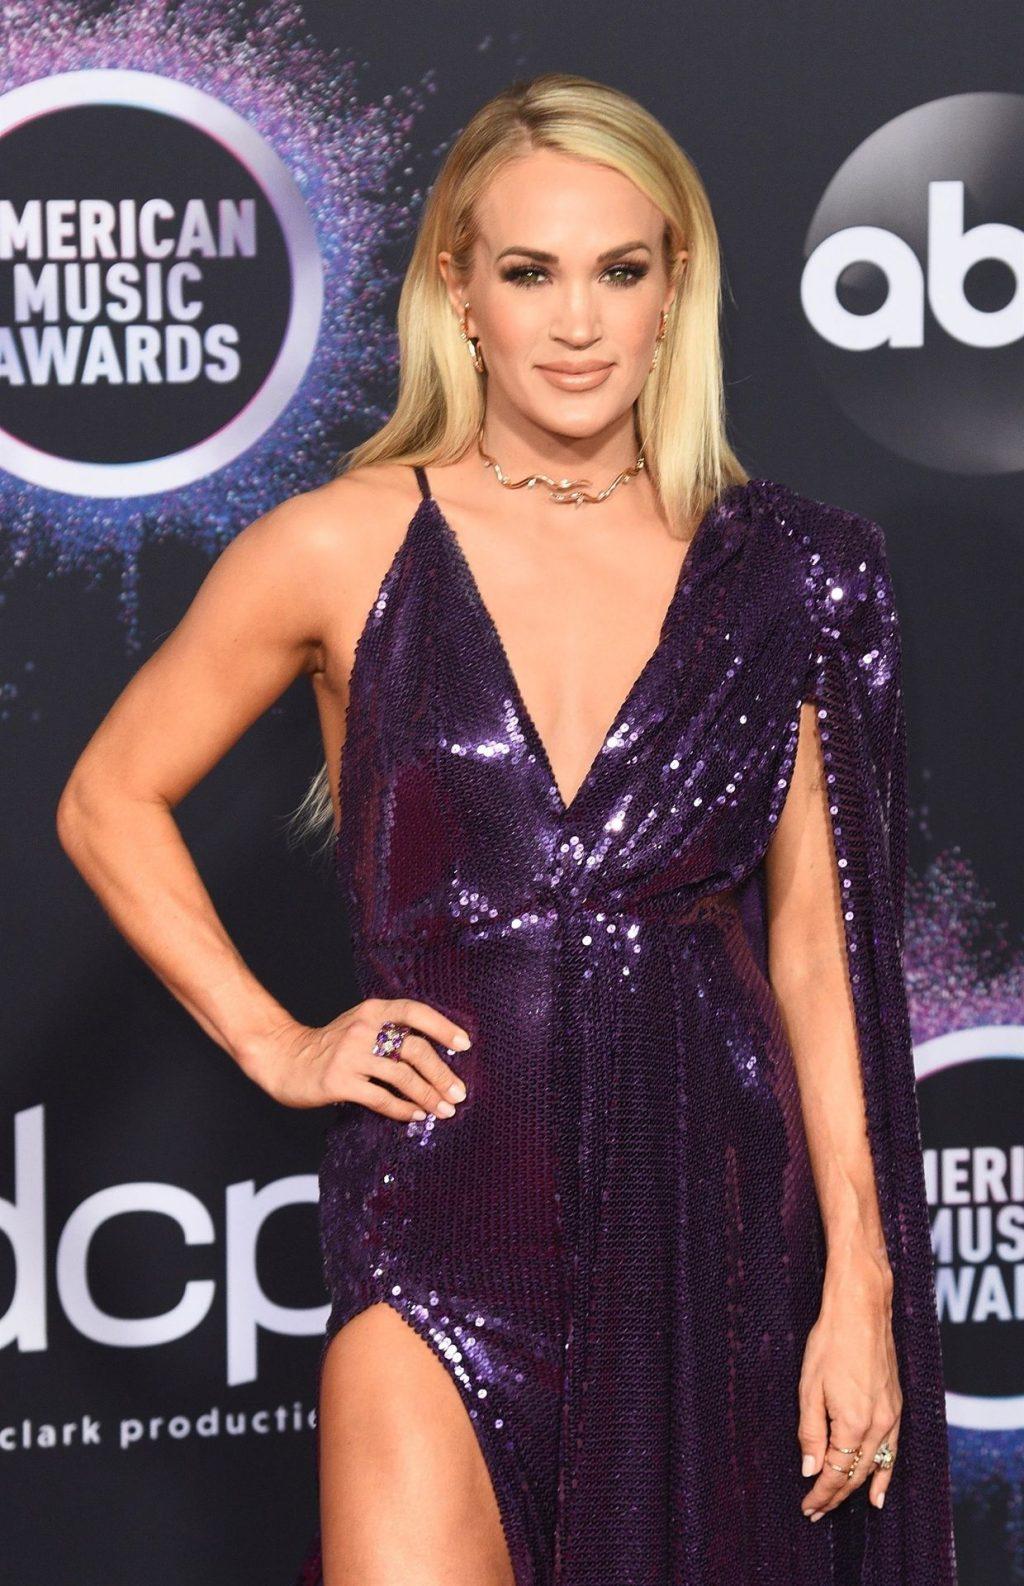 Carrie Underwood Sexy (80 Photos)